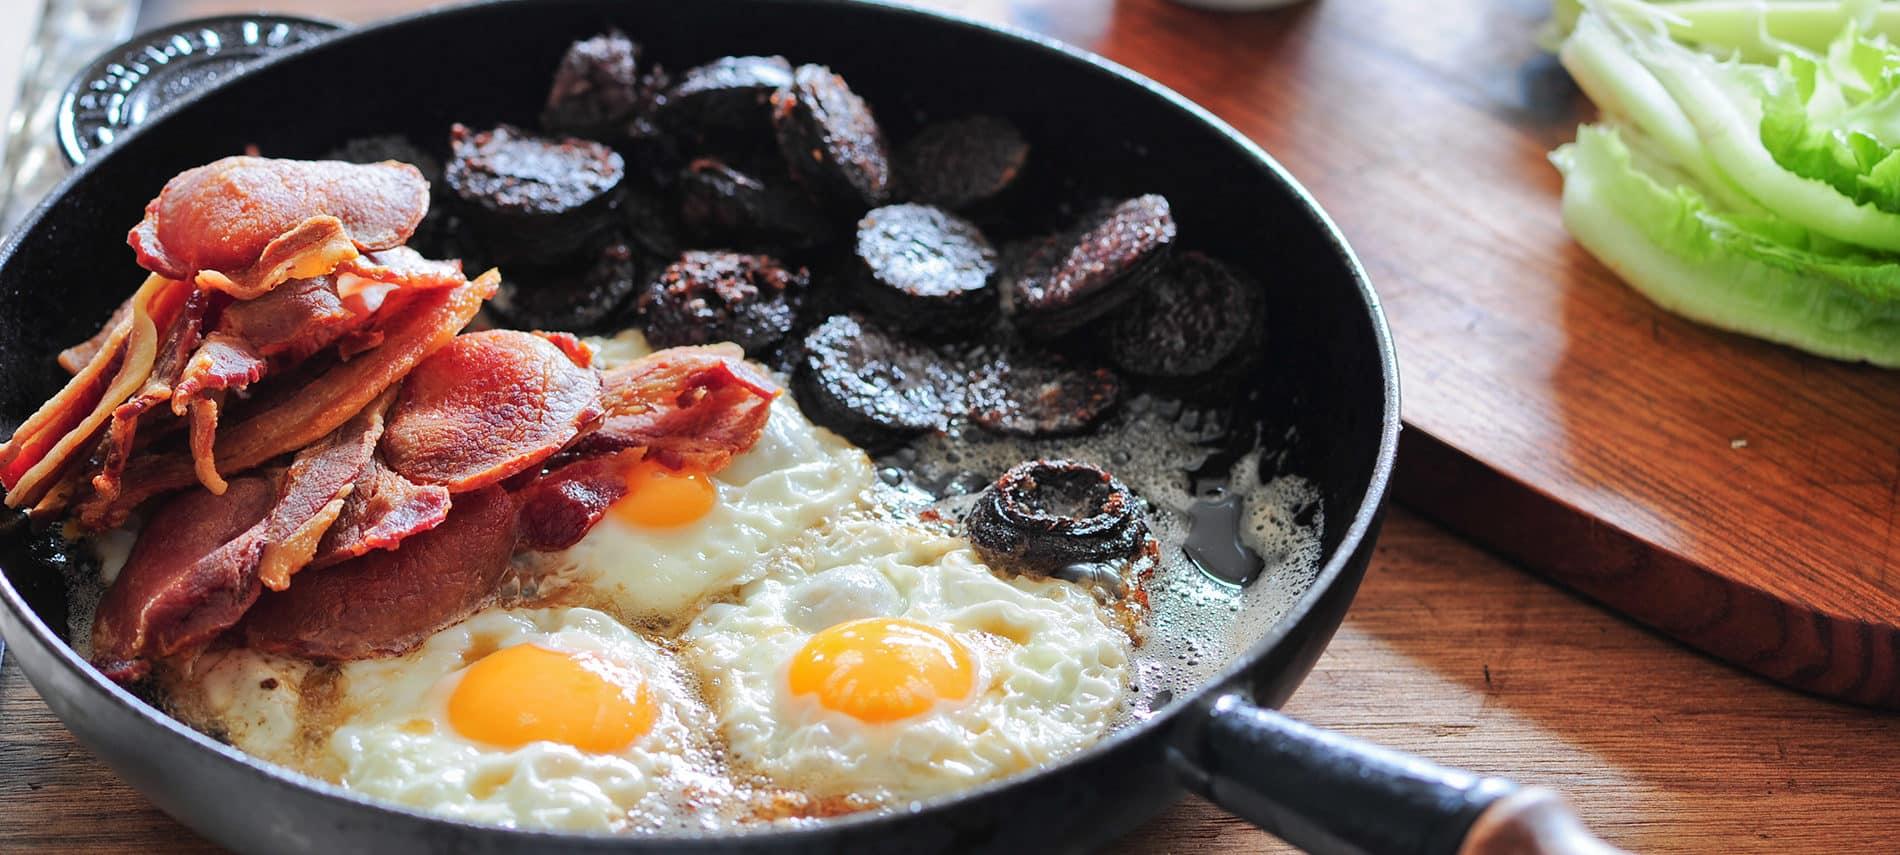 how to make a full Irish breakfast